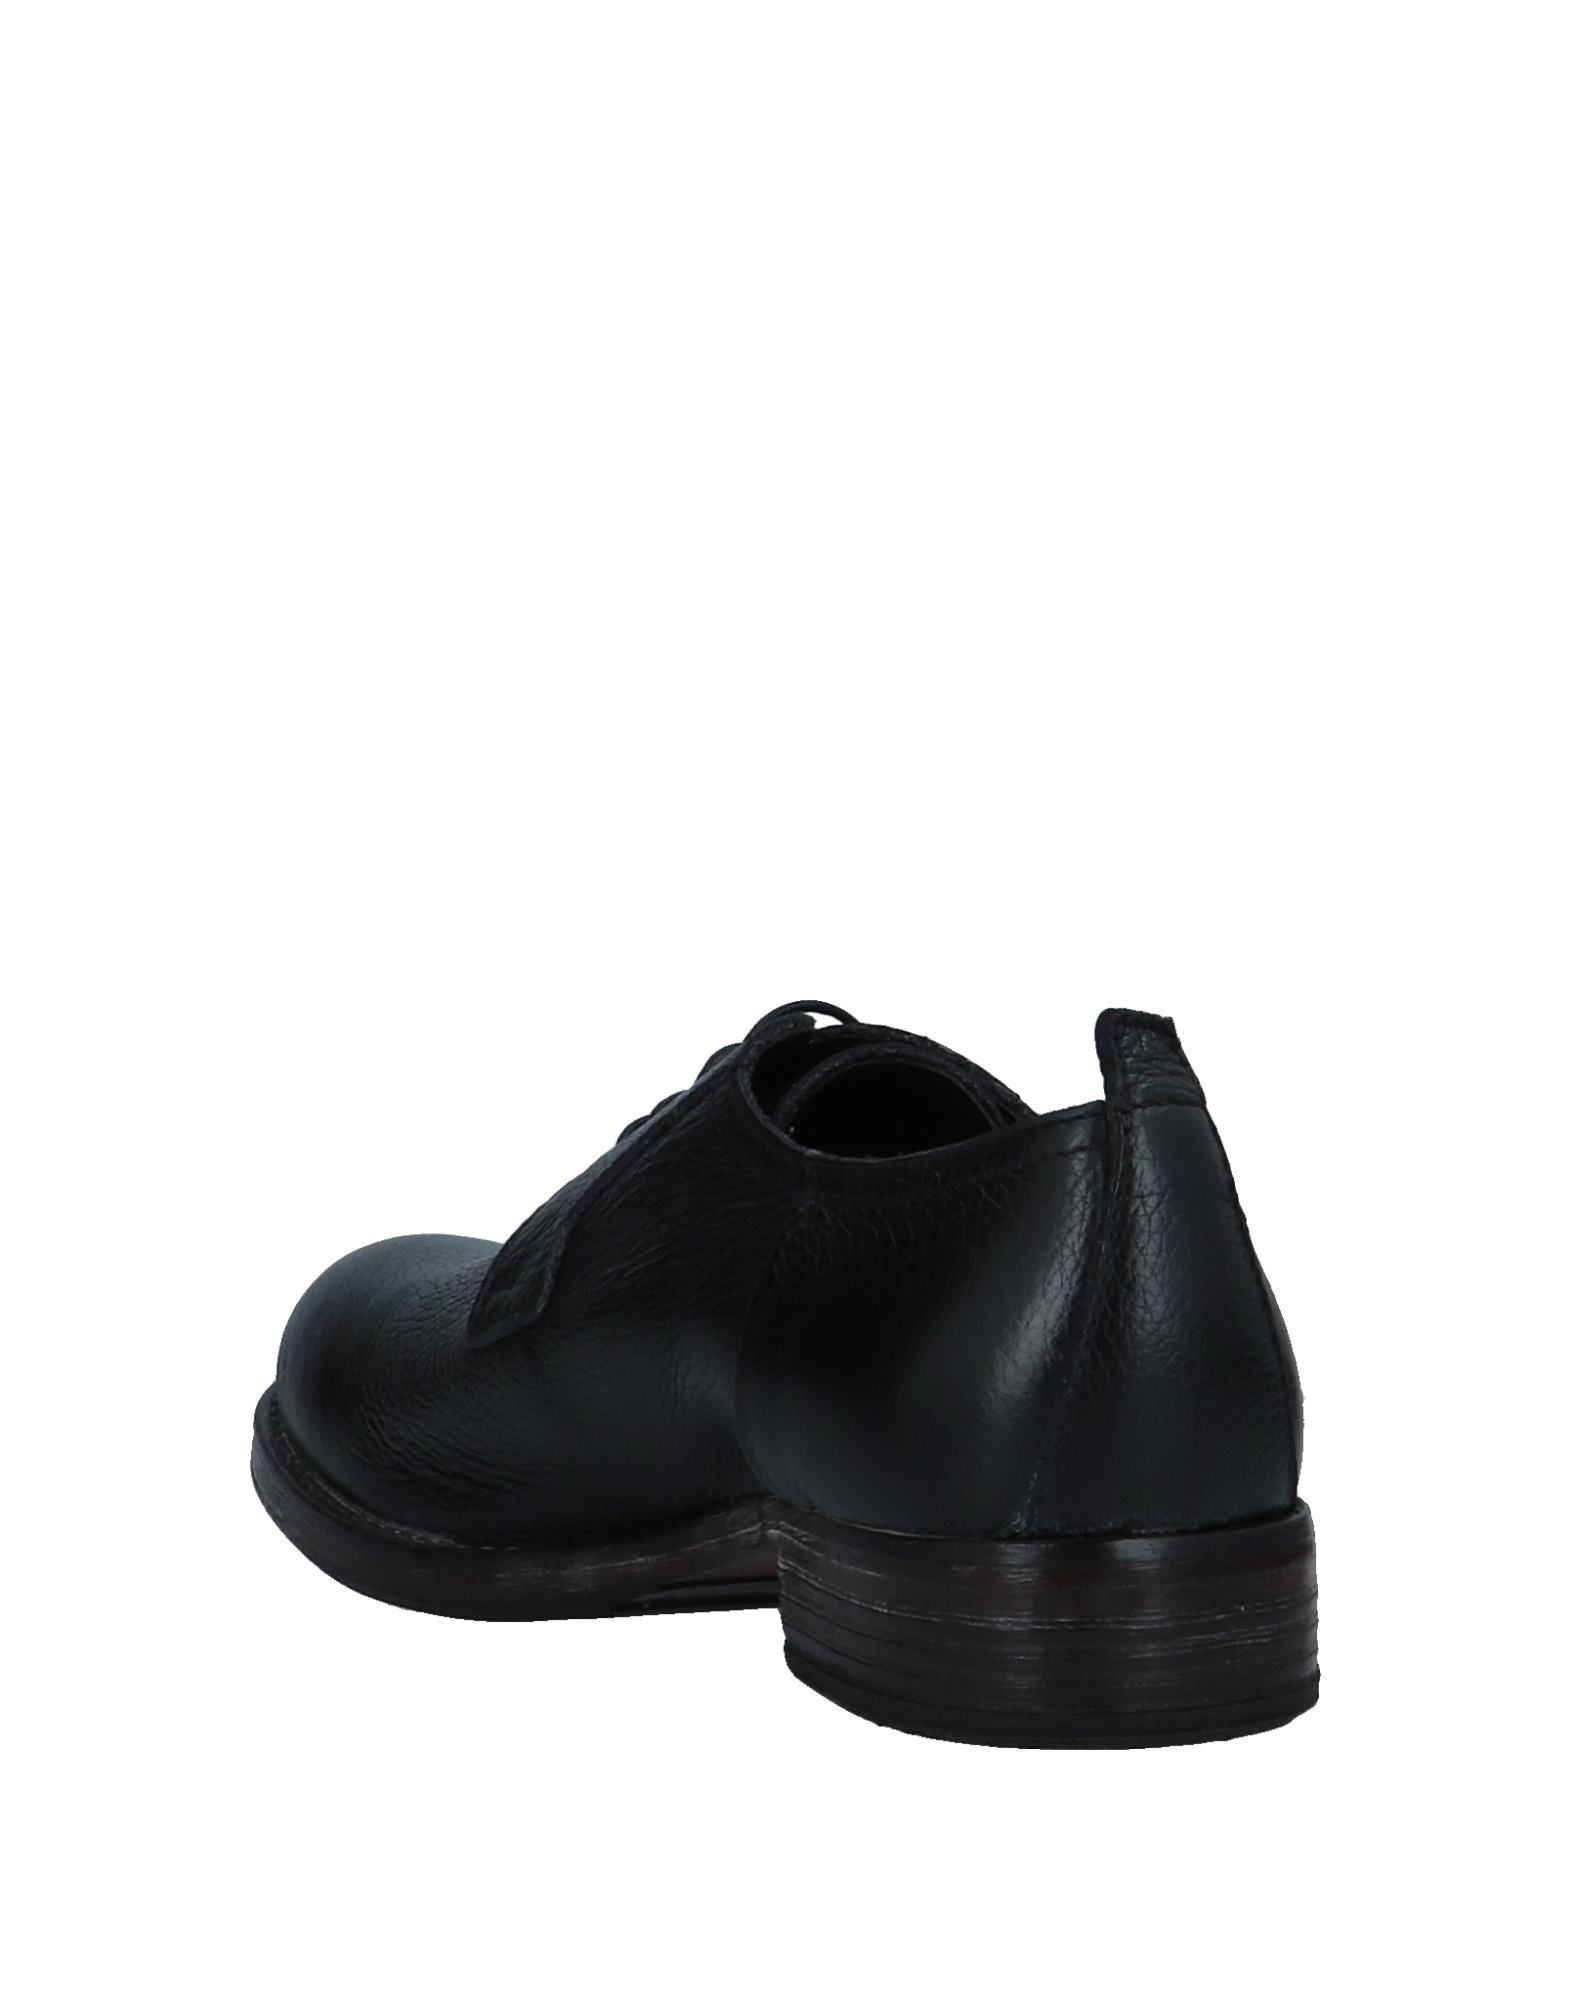 Moma 11538101KS Schnürschuhe Herren  11538101KS Moma Gute Qualität beliebte Schuhe 11fb53